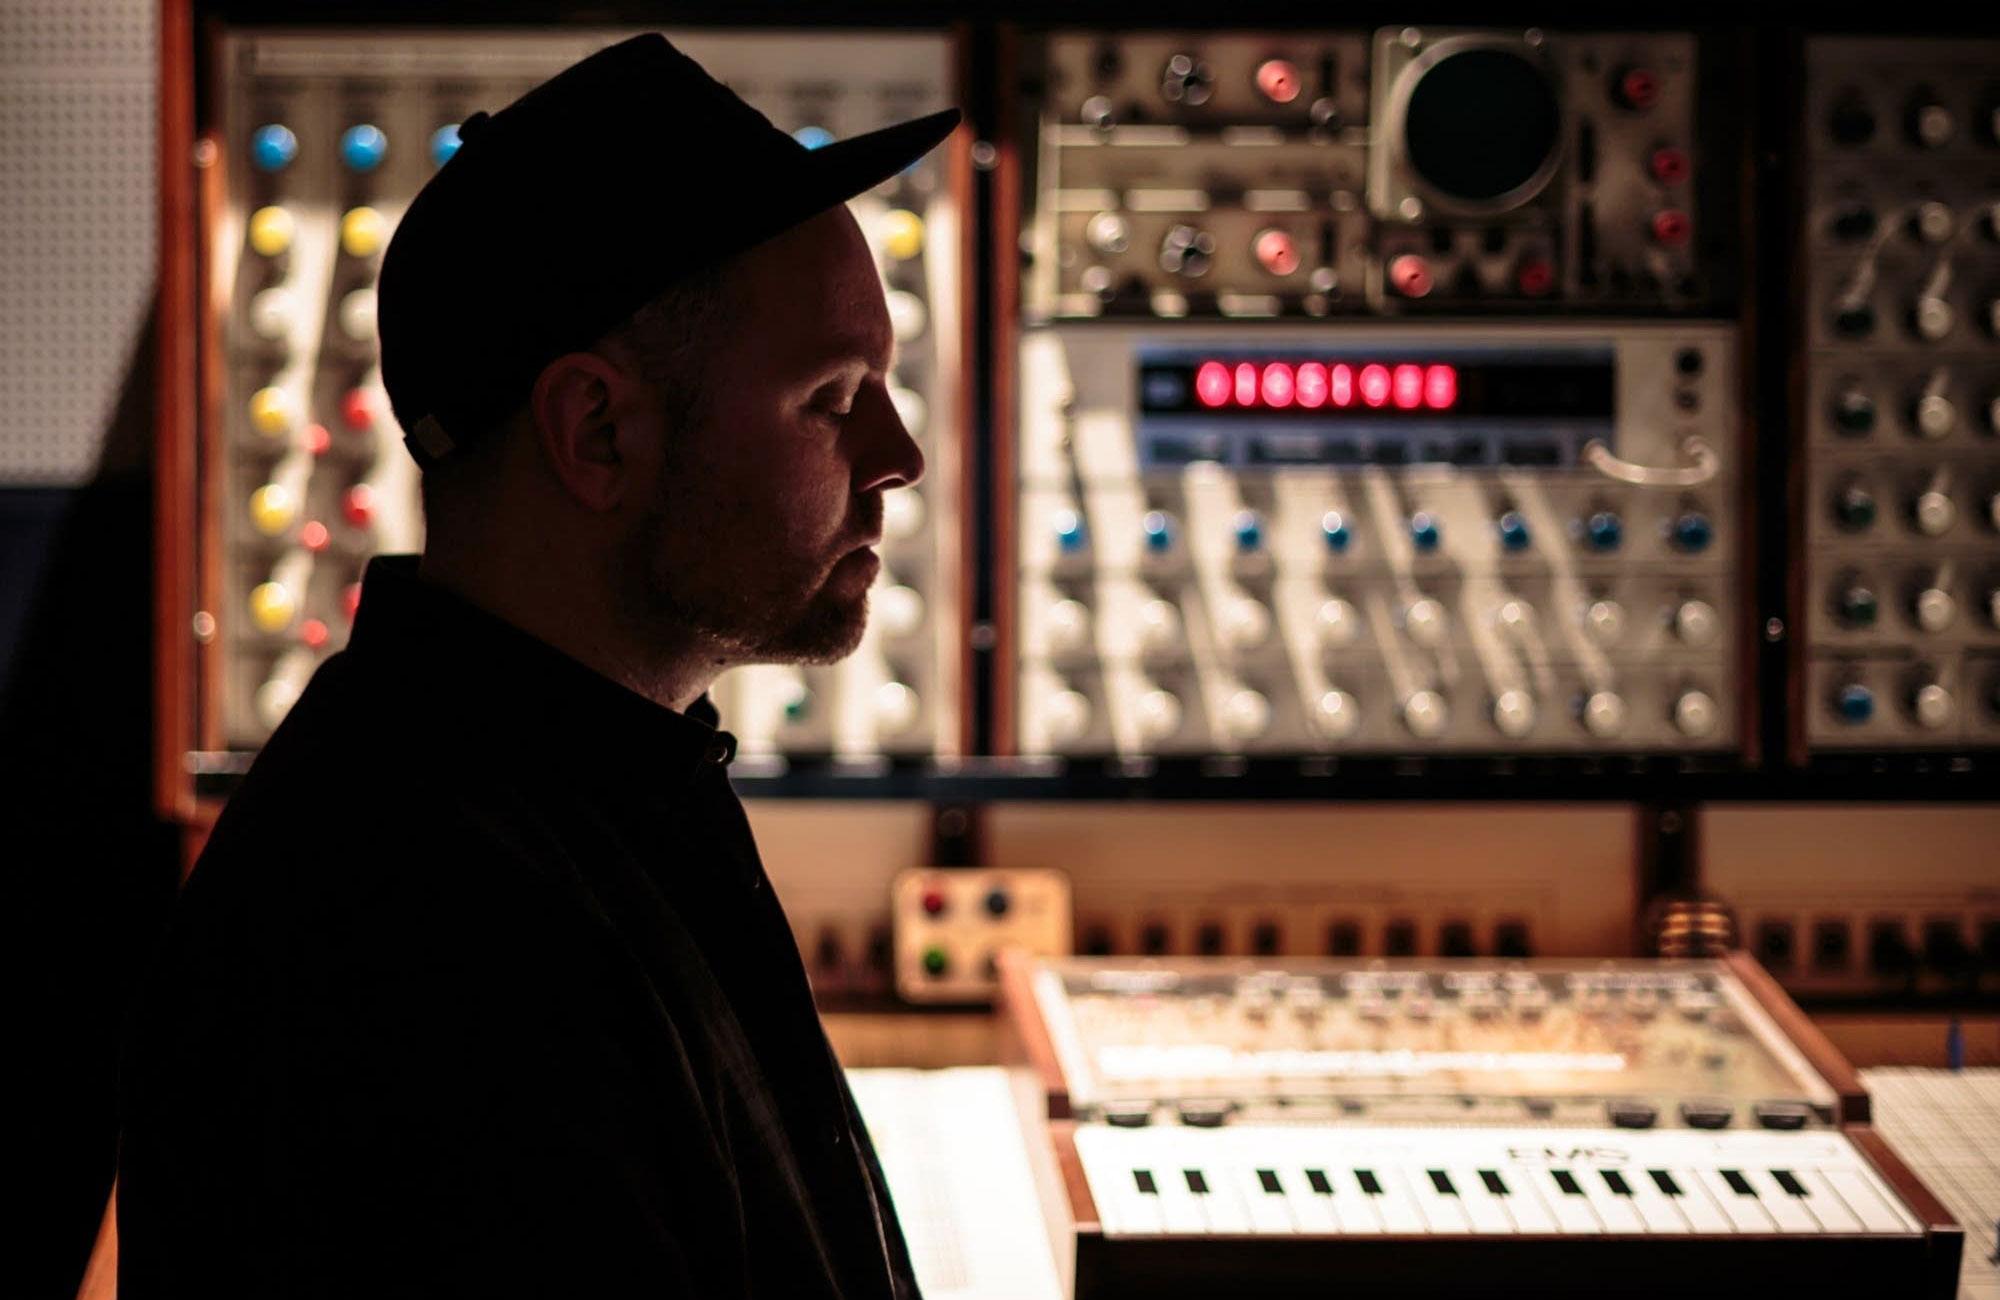 DJ-Shadow-Endtroducing-2000px-1